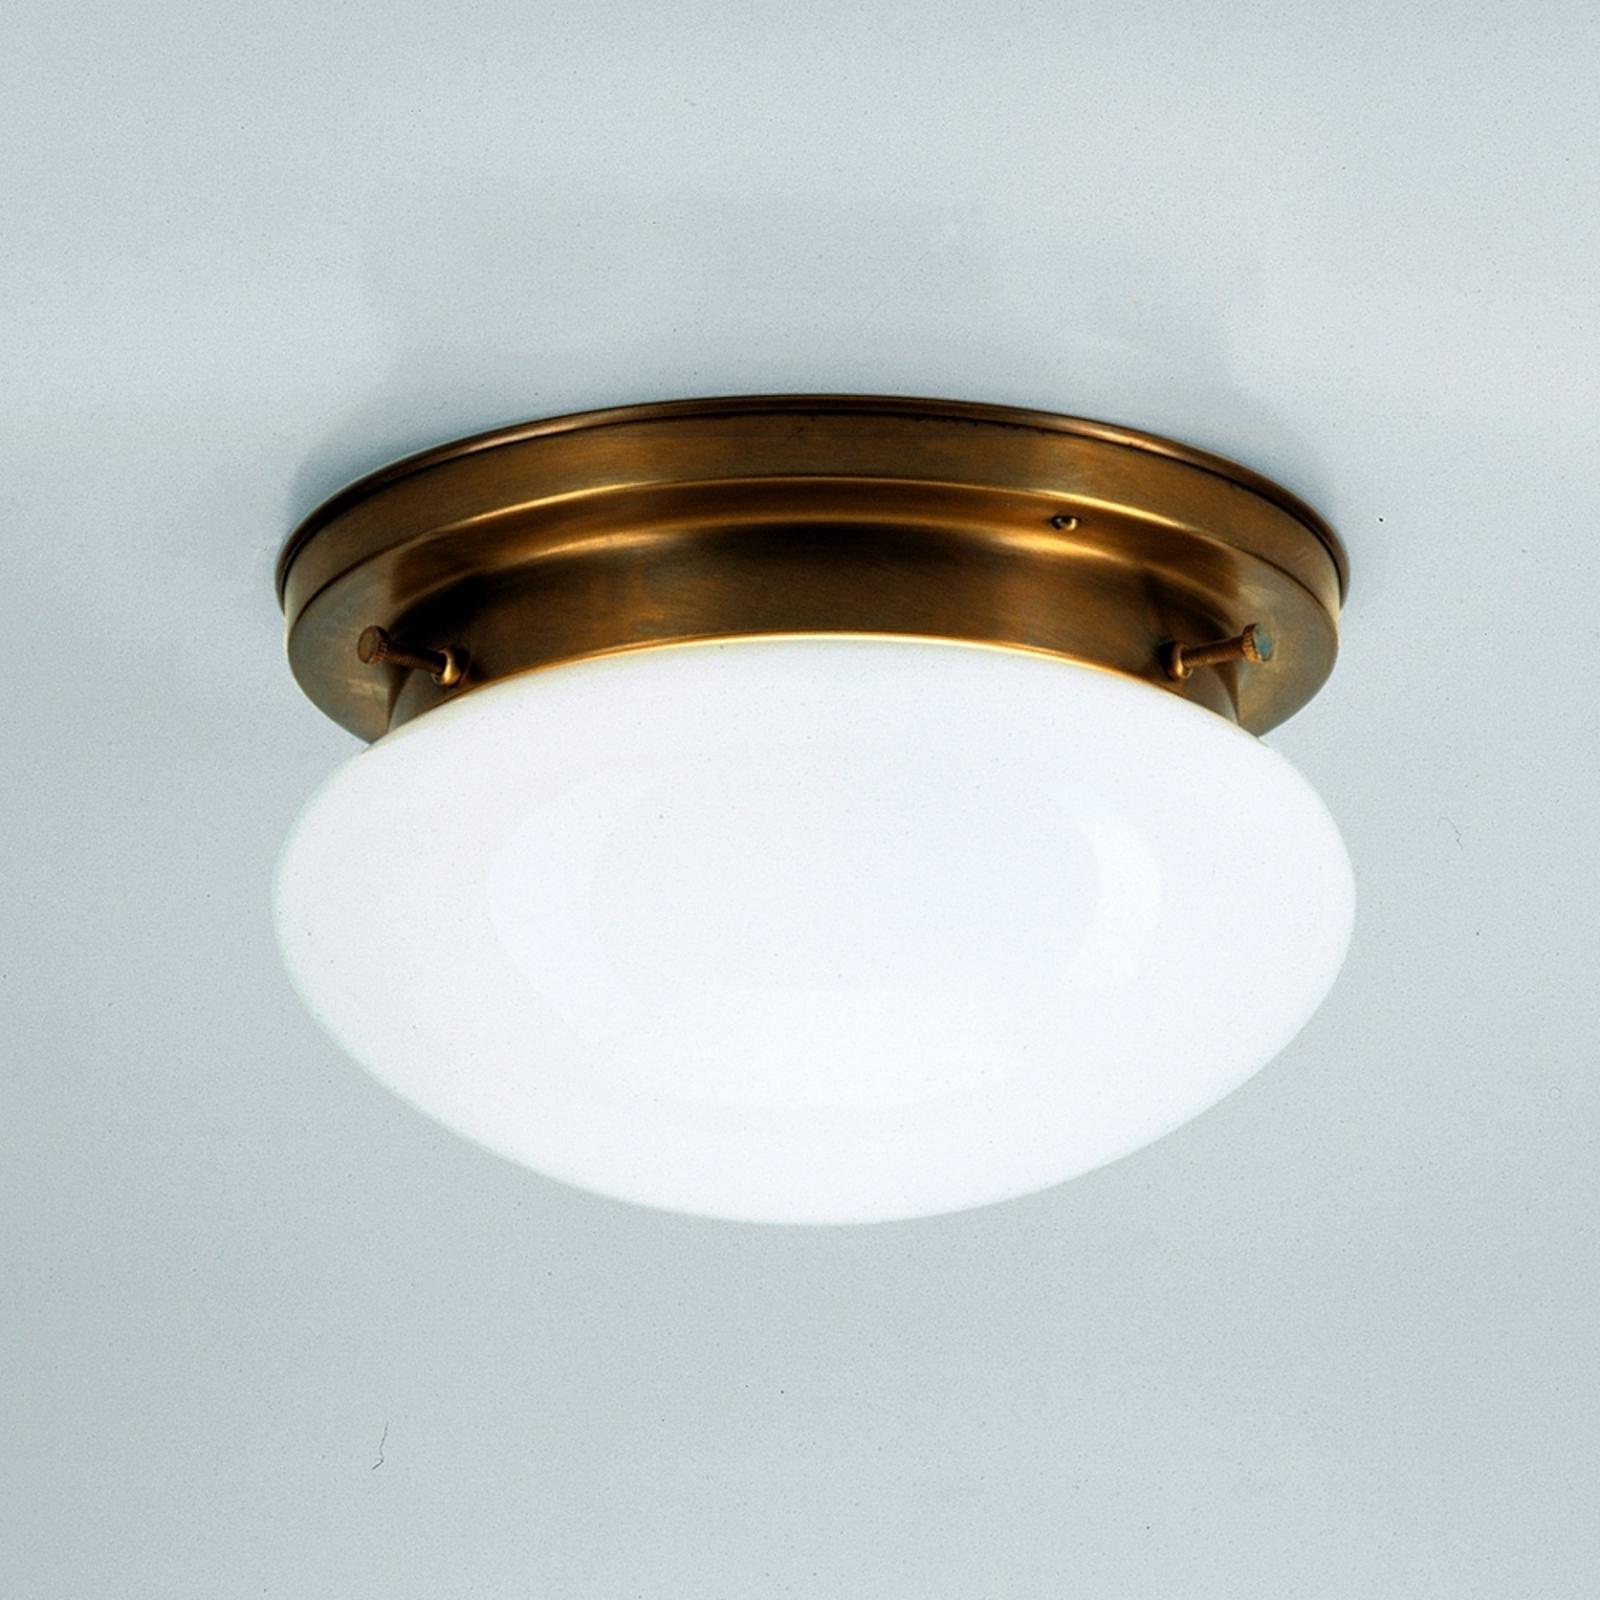 Opalen plafondlamp HARRY met messing